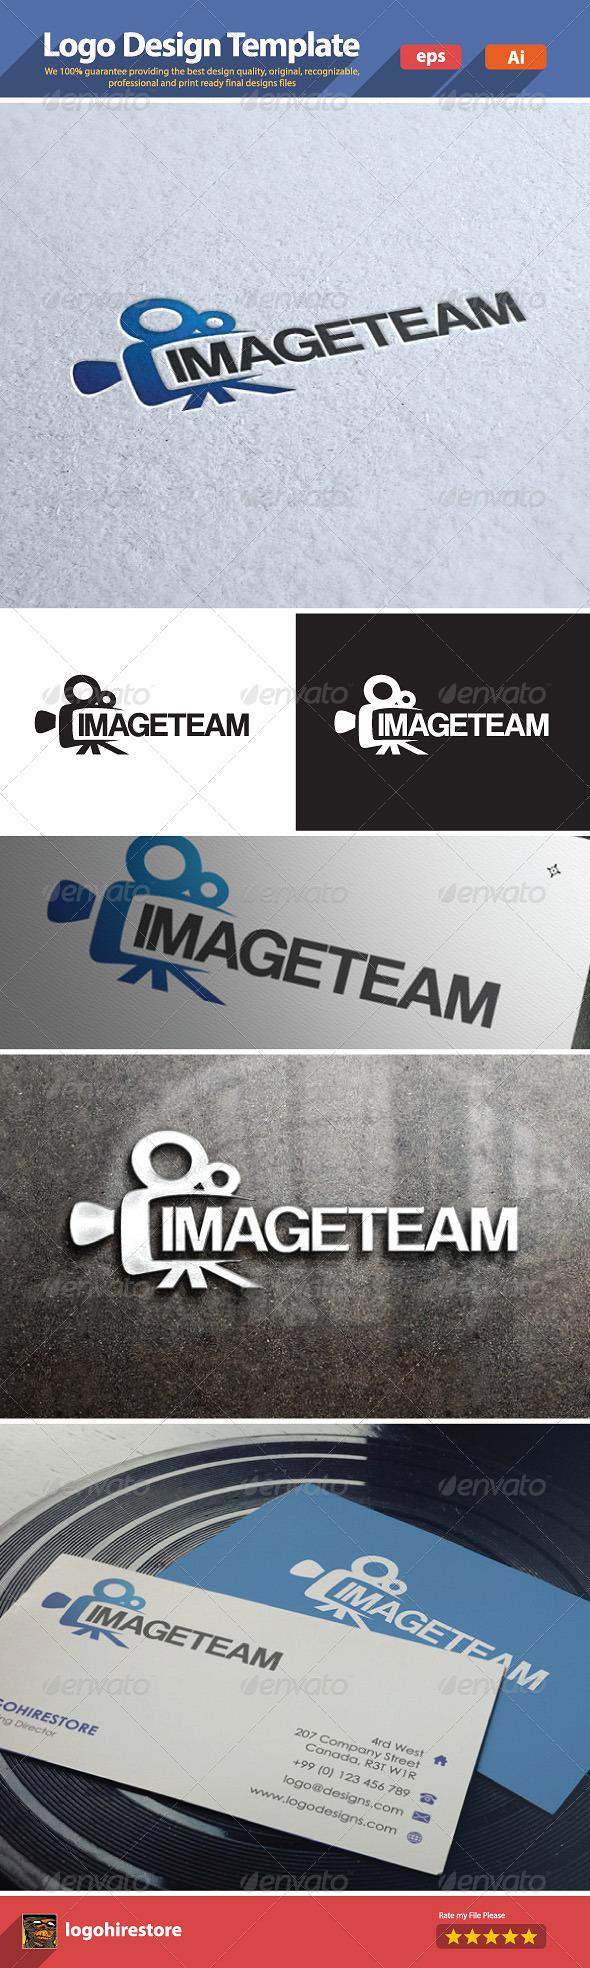 GraphicRiver Image Team 6210867